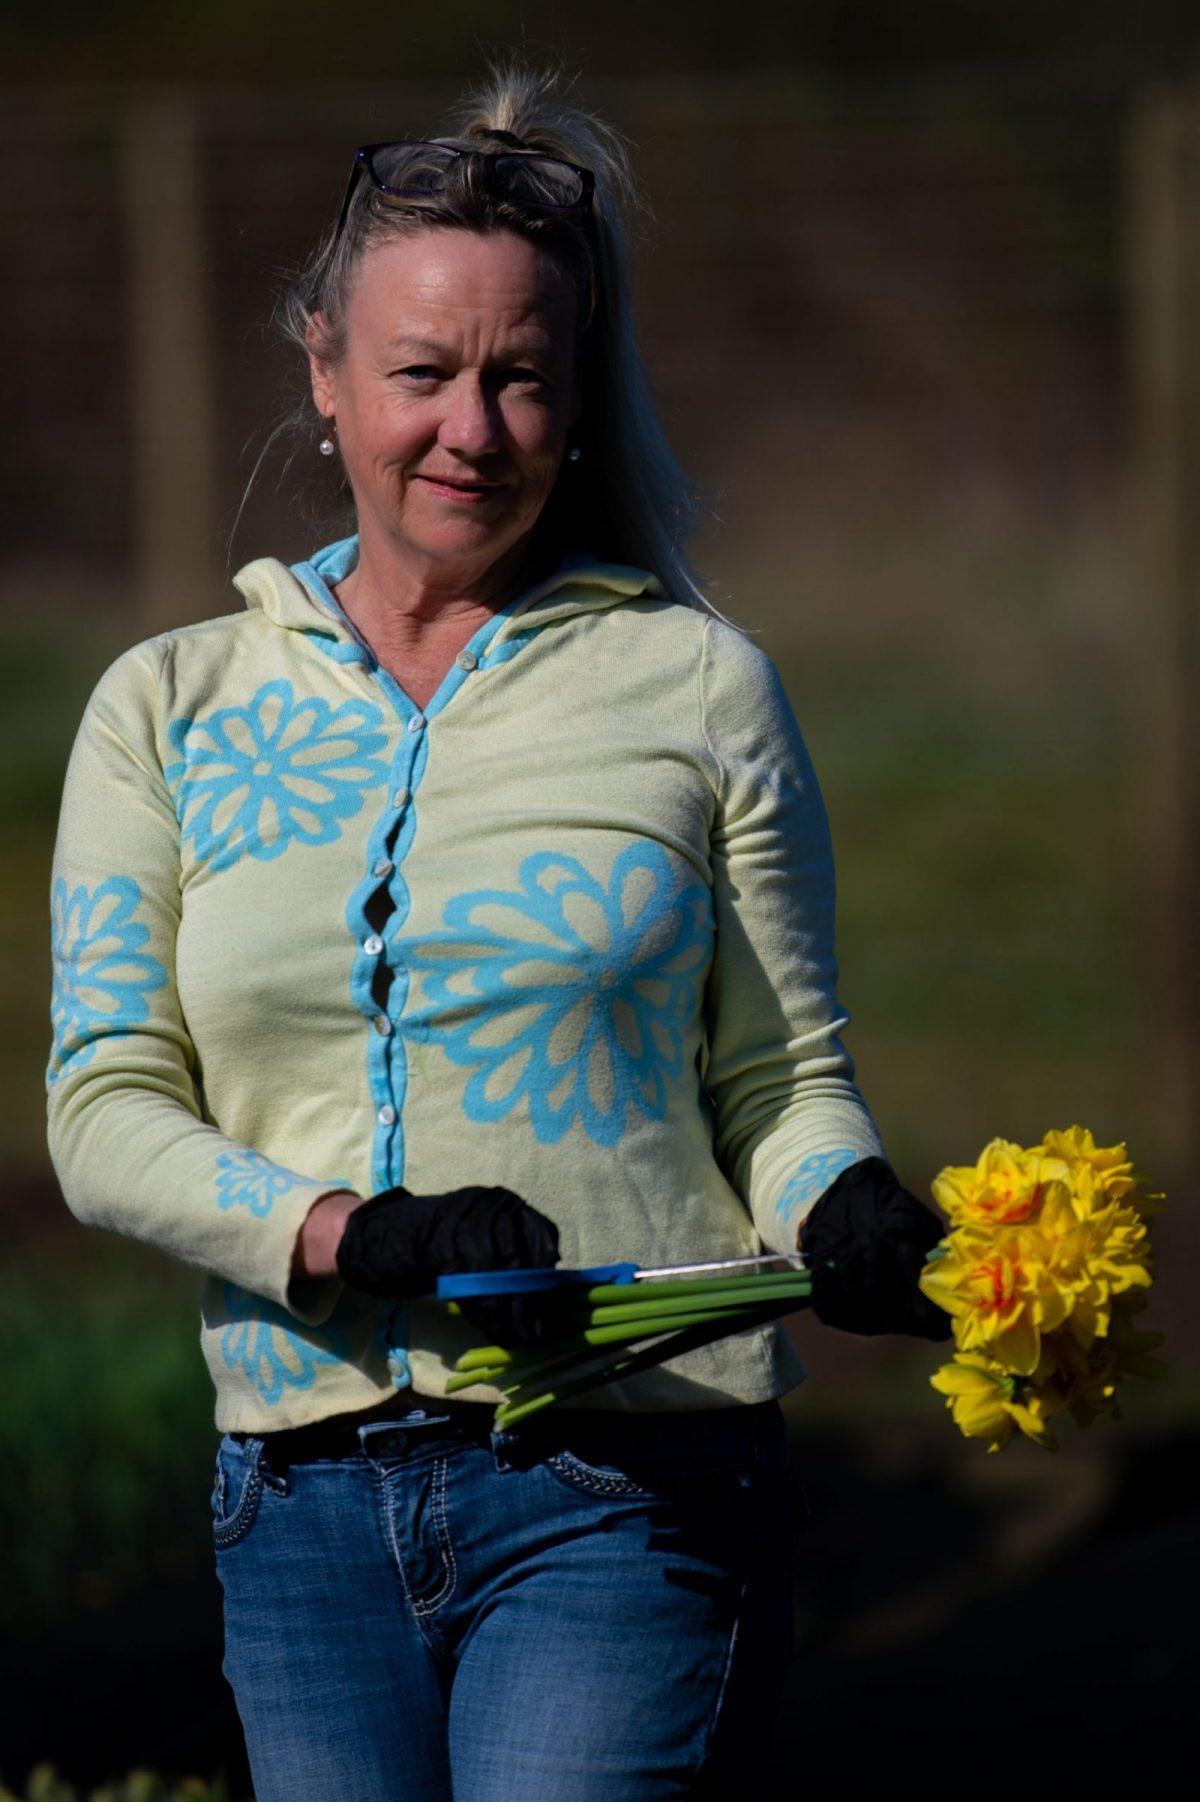 Jenny Dawson holding freshly picked daffodils